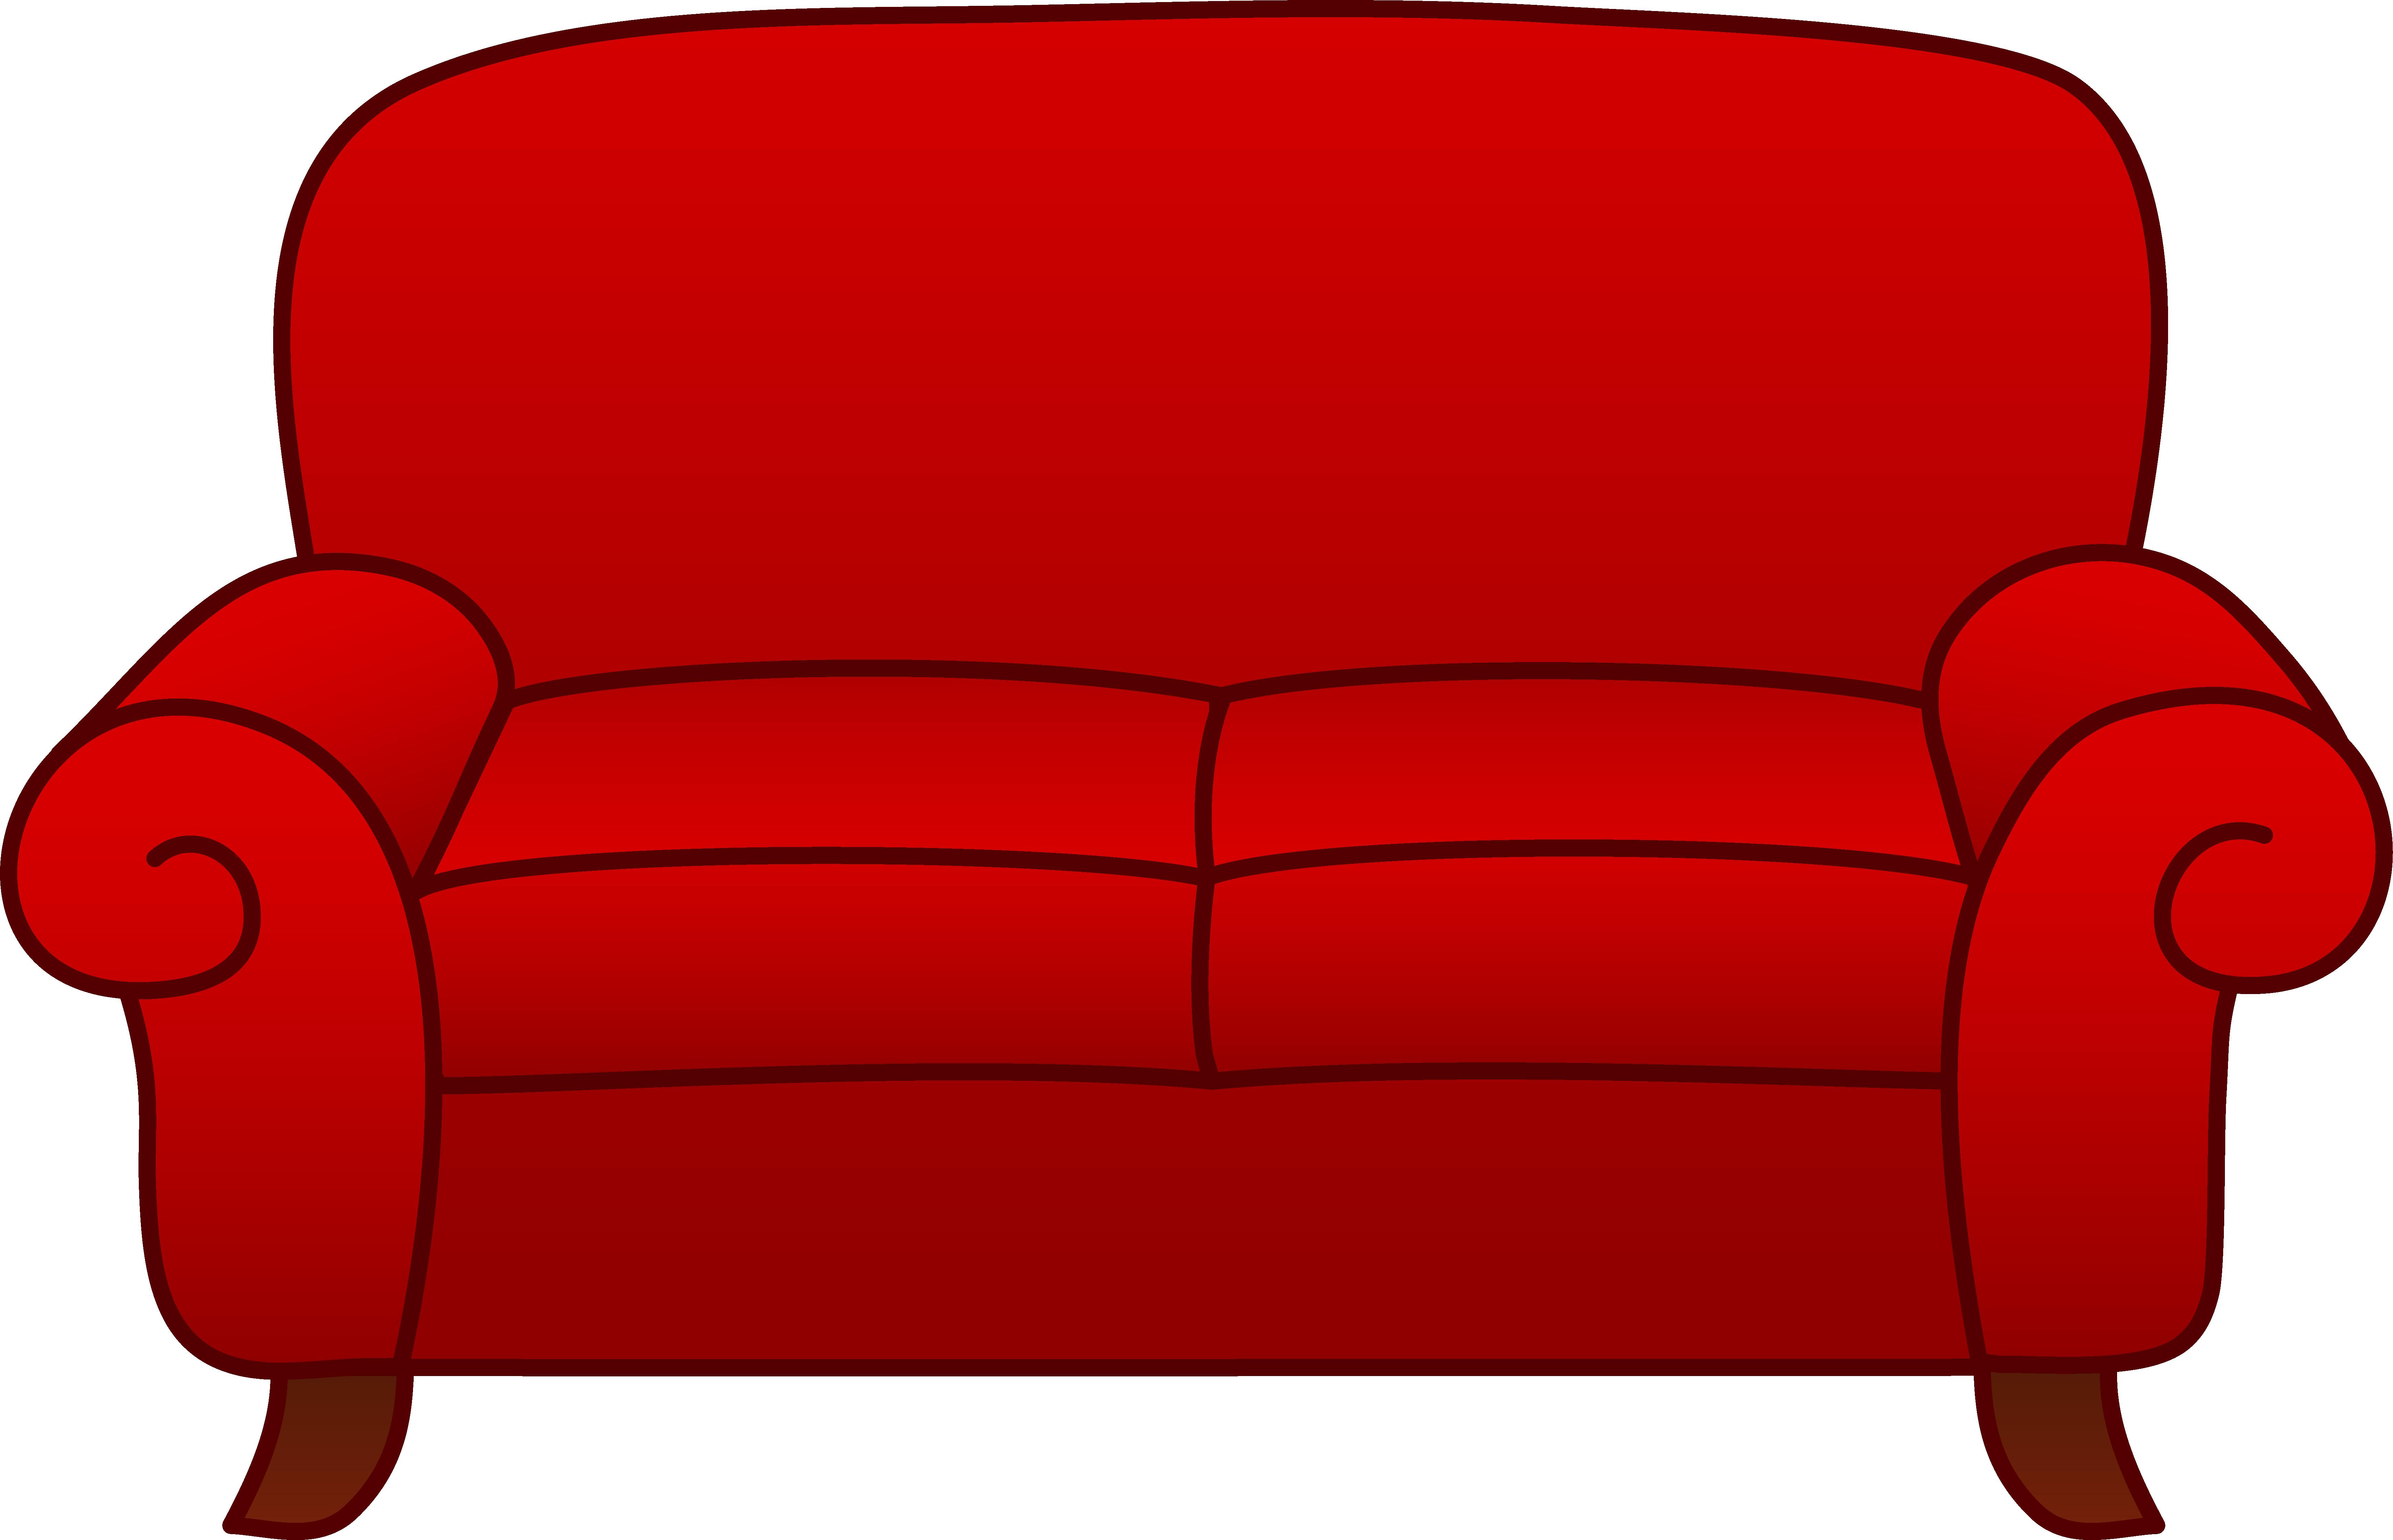 Red Sofa Clip Art Clipart Panda Free Clipart Images